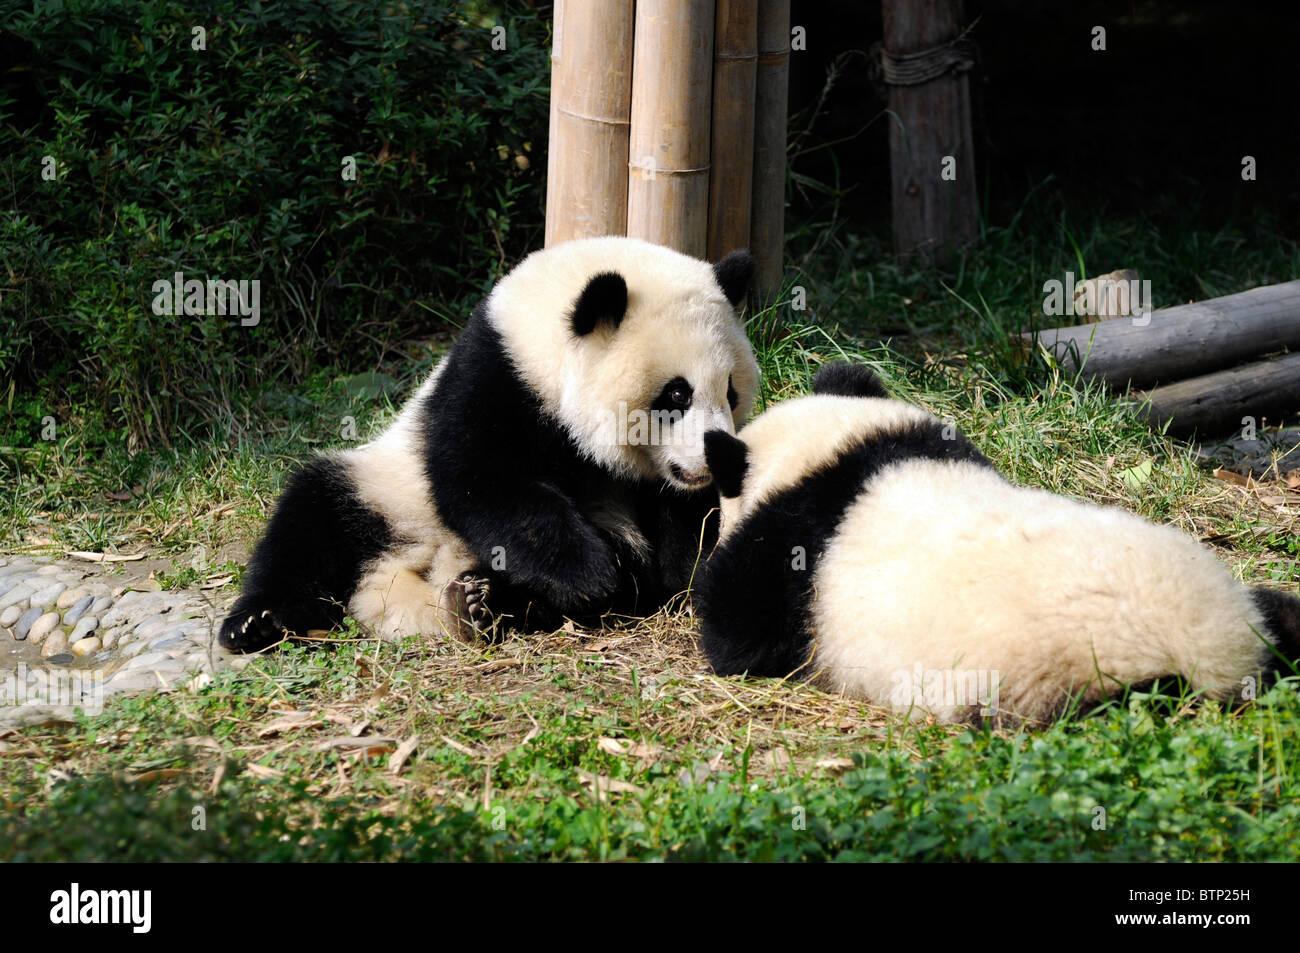 Giant Pandas (Ailuropoda melanoleuca) at Chengdu Panda Breeding Reserve, Sichuan province, China - Stock Image